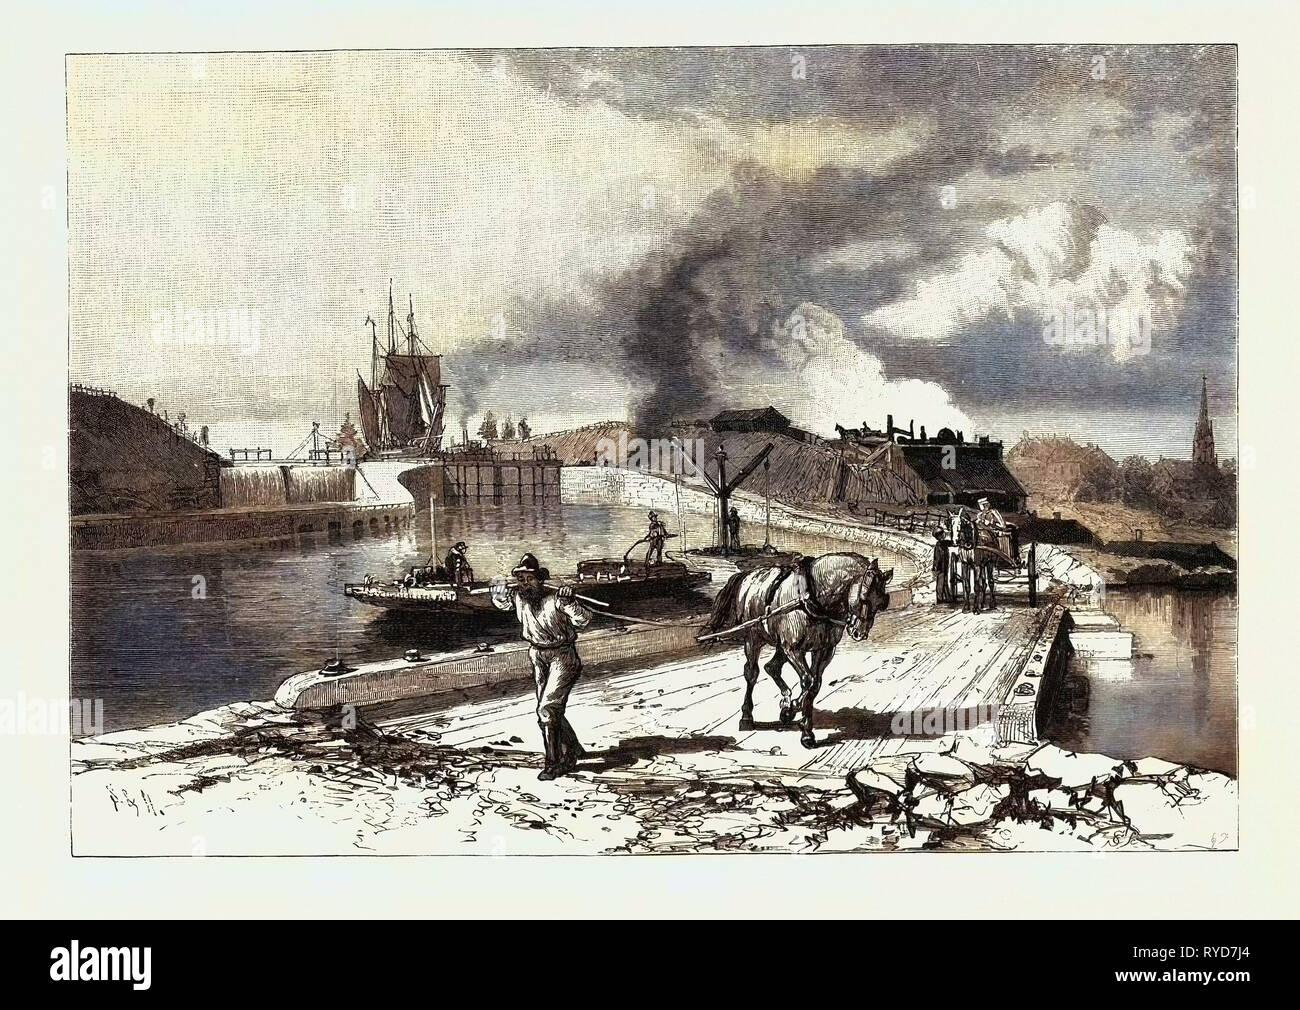 Lock No. 23, Thorold, Canada, Nineteenth Century Engraving - Stock Image